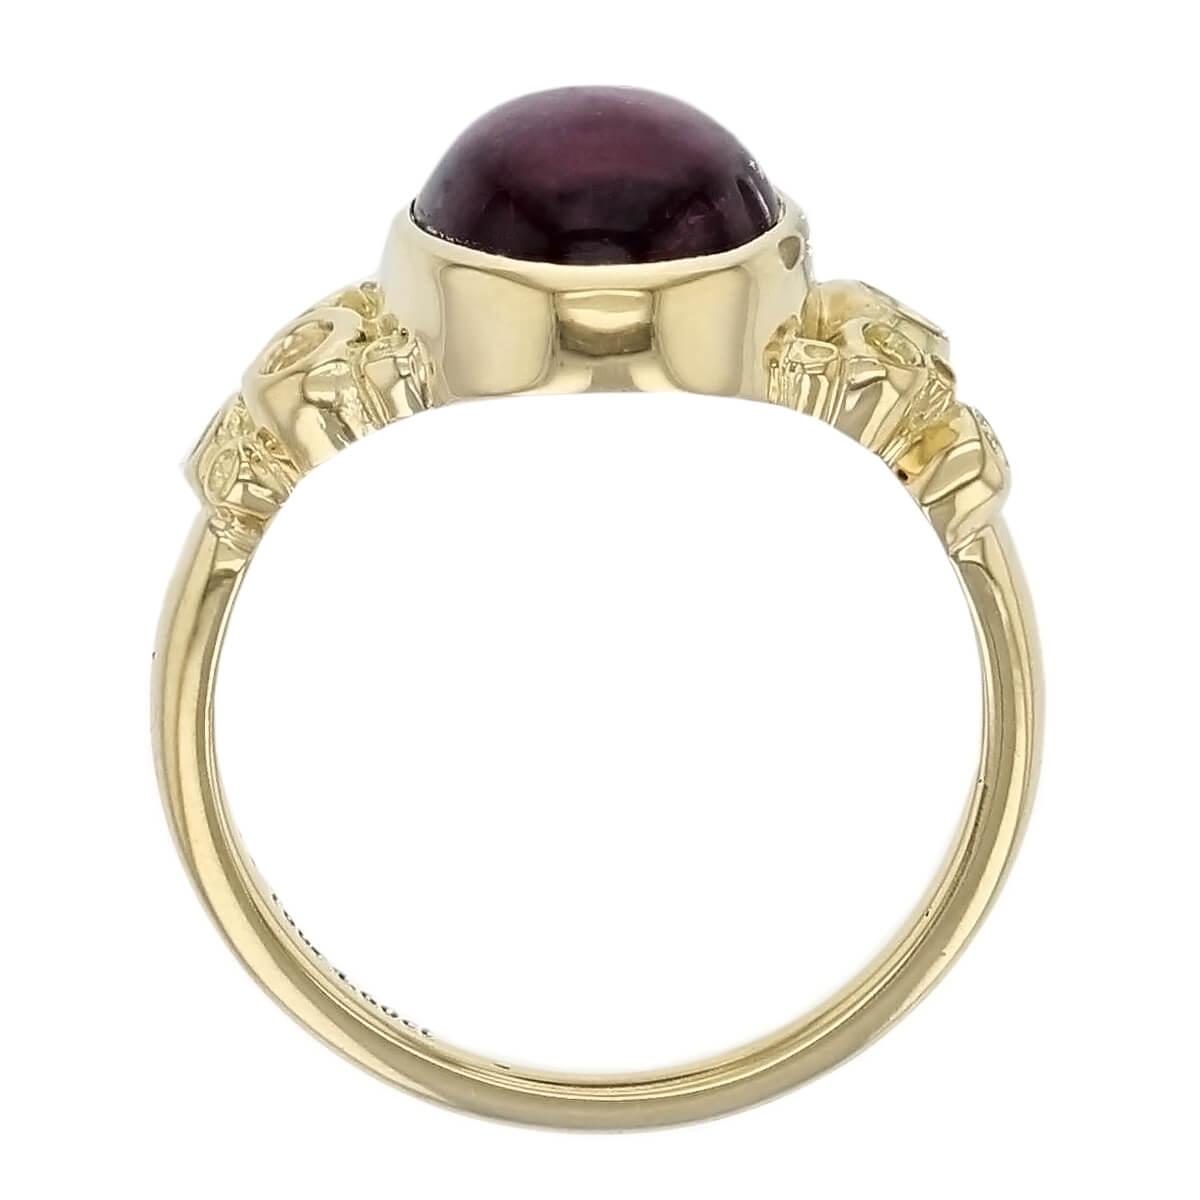 Kandy Fizz 18ct yellow gold pink oval cut cabochon tourmaline gemstone ladies dress ring, designer jewellery, gem, jewelry, handmade by Faller, Londonderry, Northern Ireland, Irish hand crafted